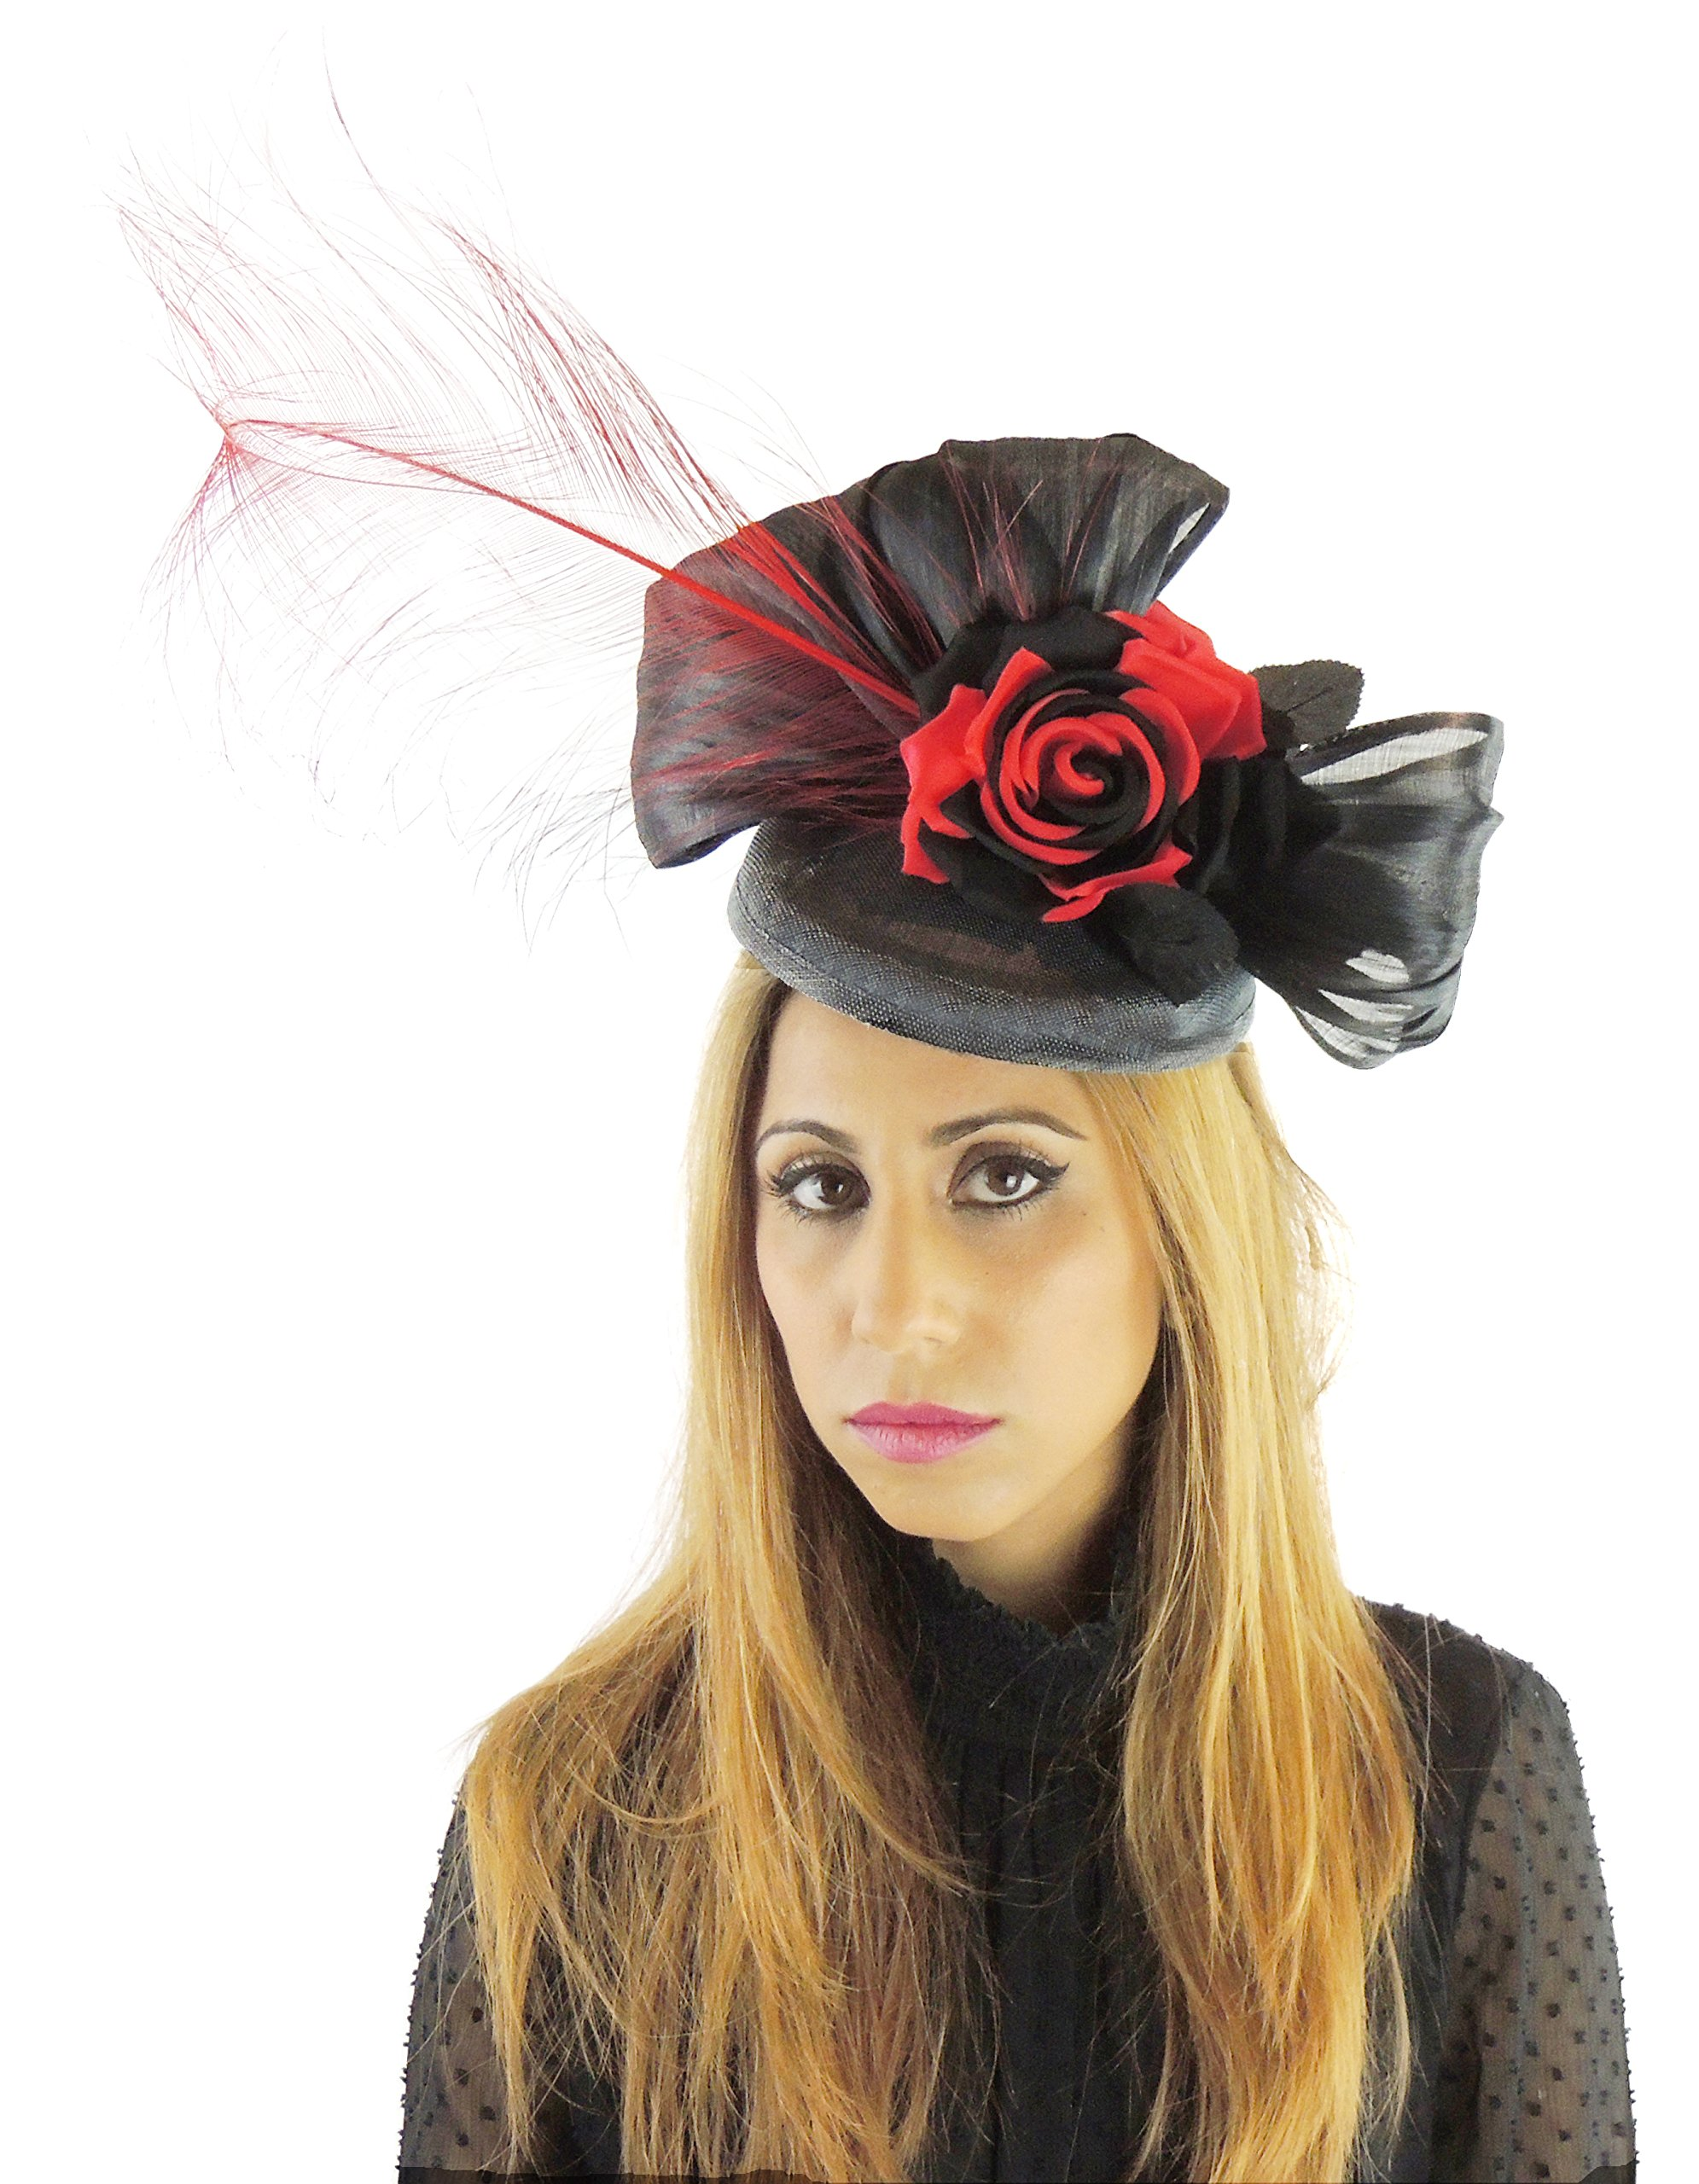 Hats By Cressida Silk Sinamay & Silk Flower Elegant Ladies Ascot Wedding Fascinator Hat Black & Red by Hats By Cressida